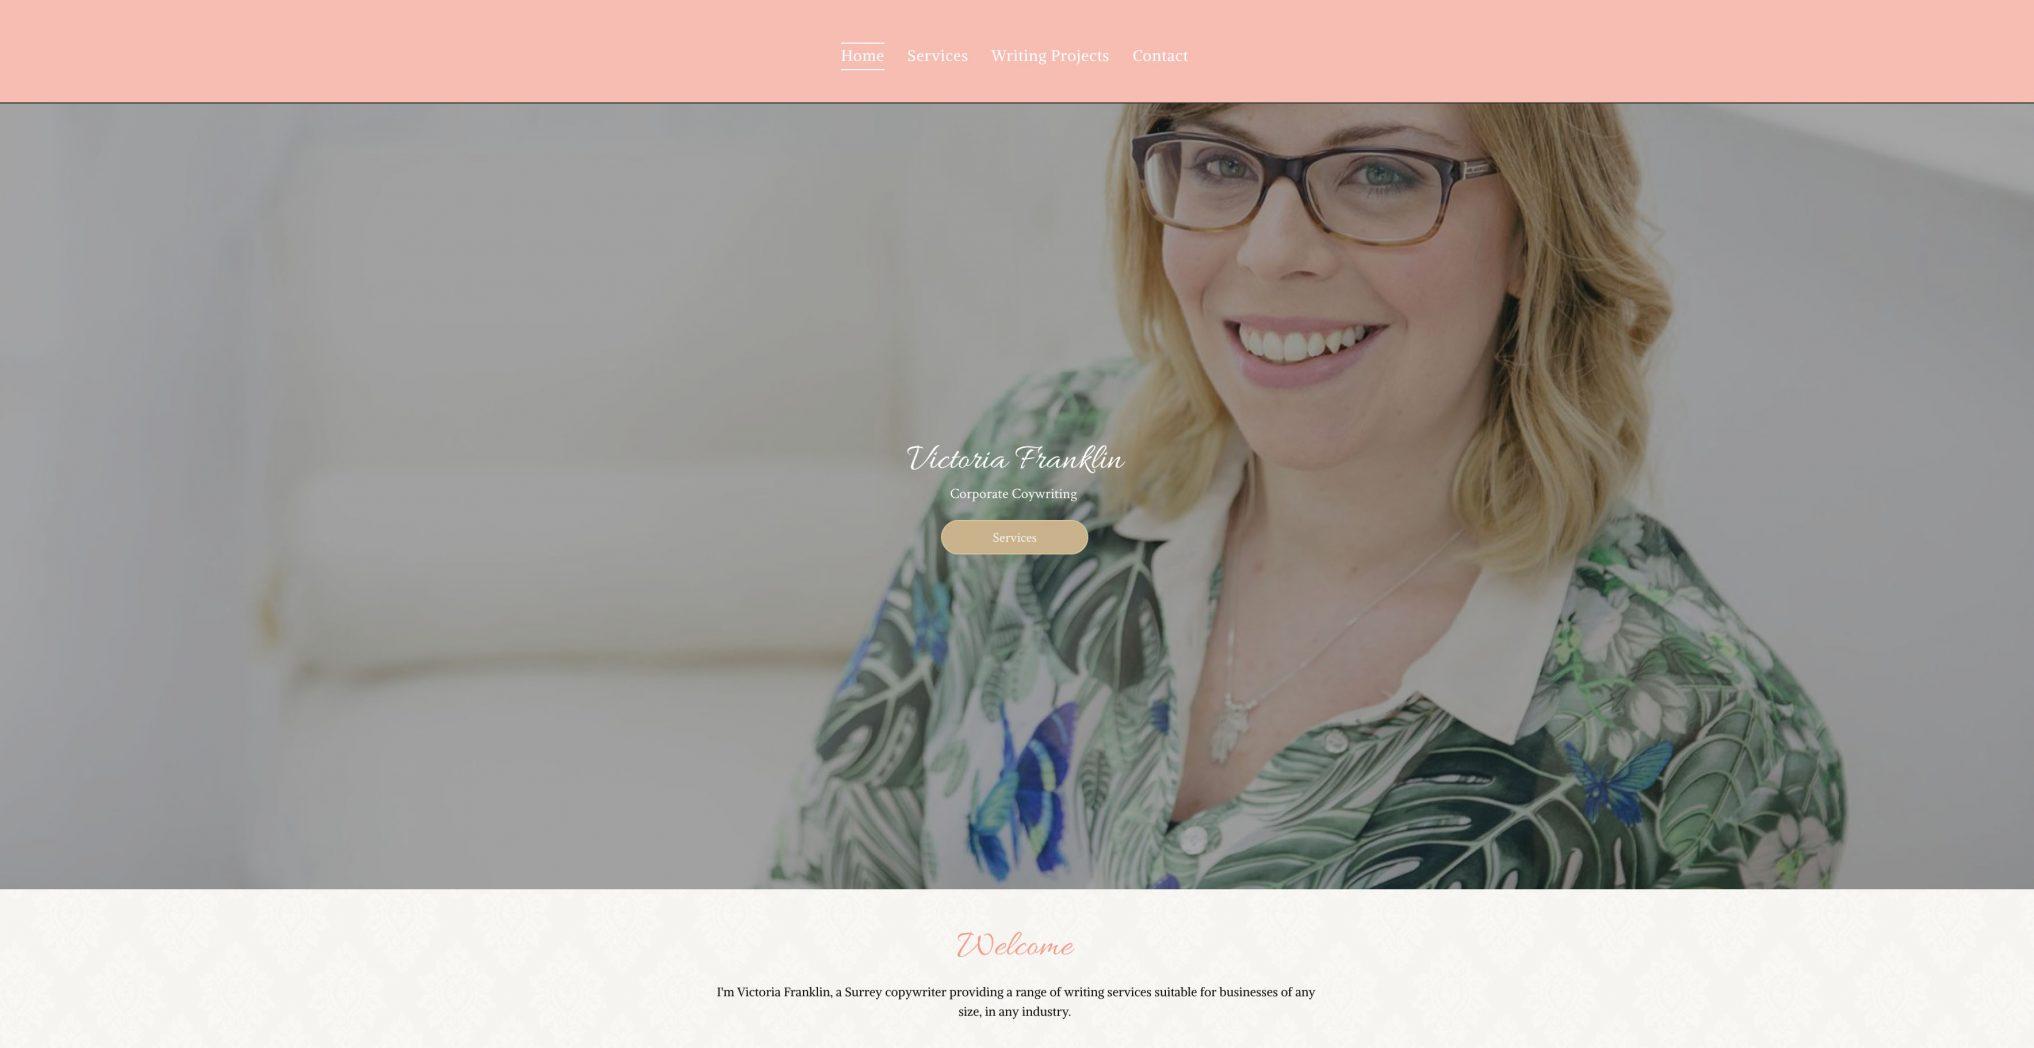 VictoriaFranklin.co.uk